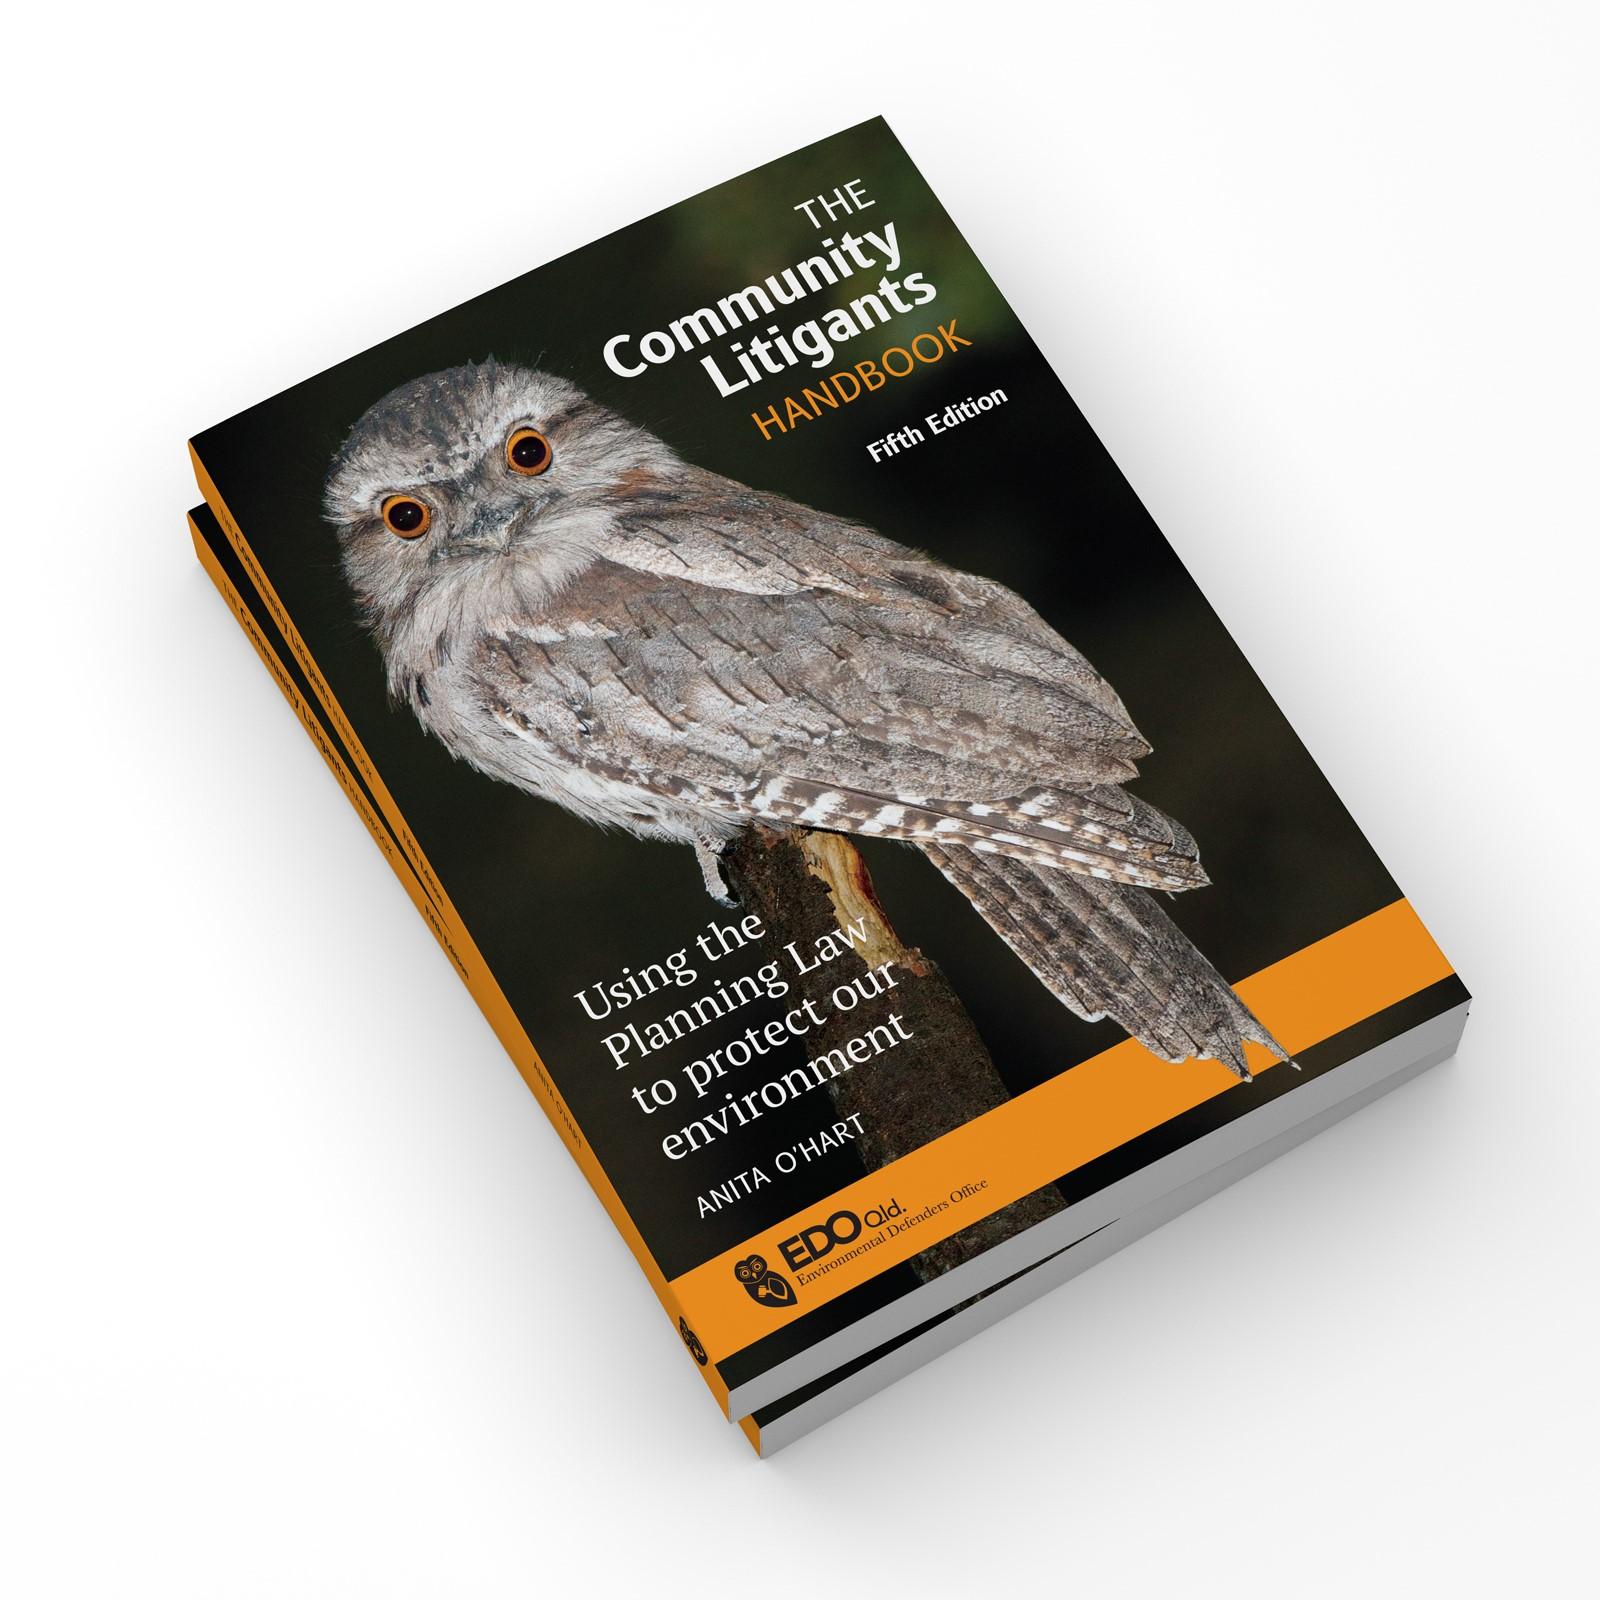 4th-edition-CL-handbook-cover.jpg